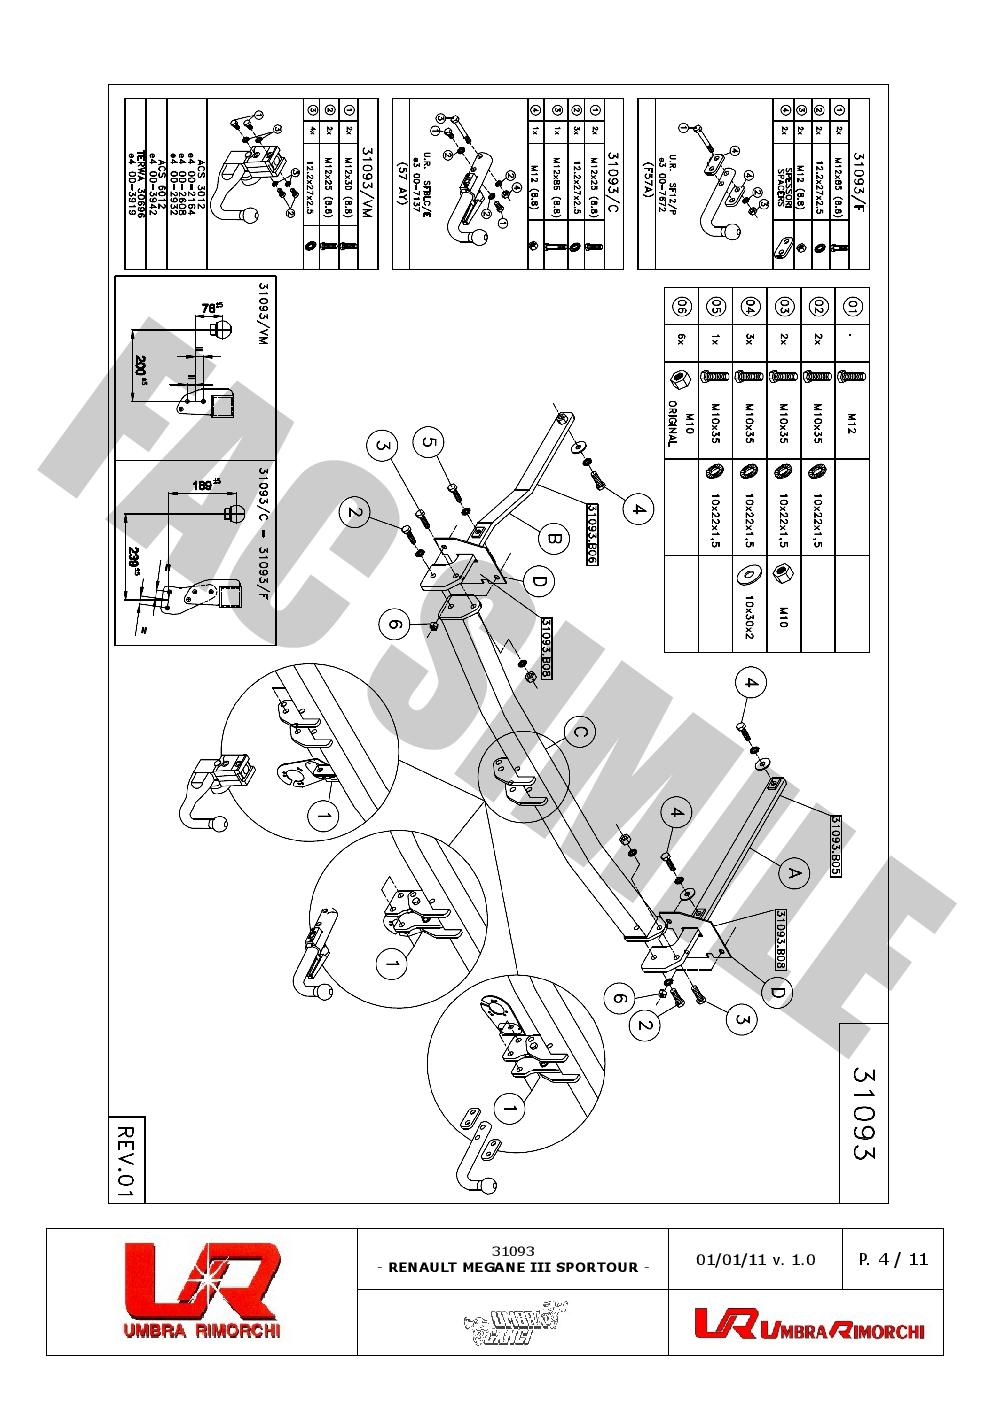 Swan Neck Towbar For Renault Megane Iii Sportour Est 2009on Tow Bar Wiring Diagram